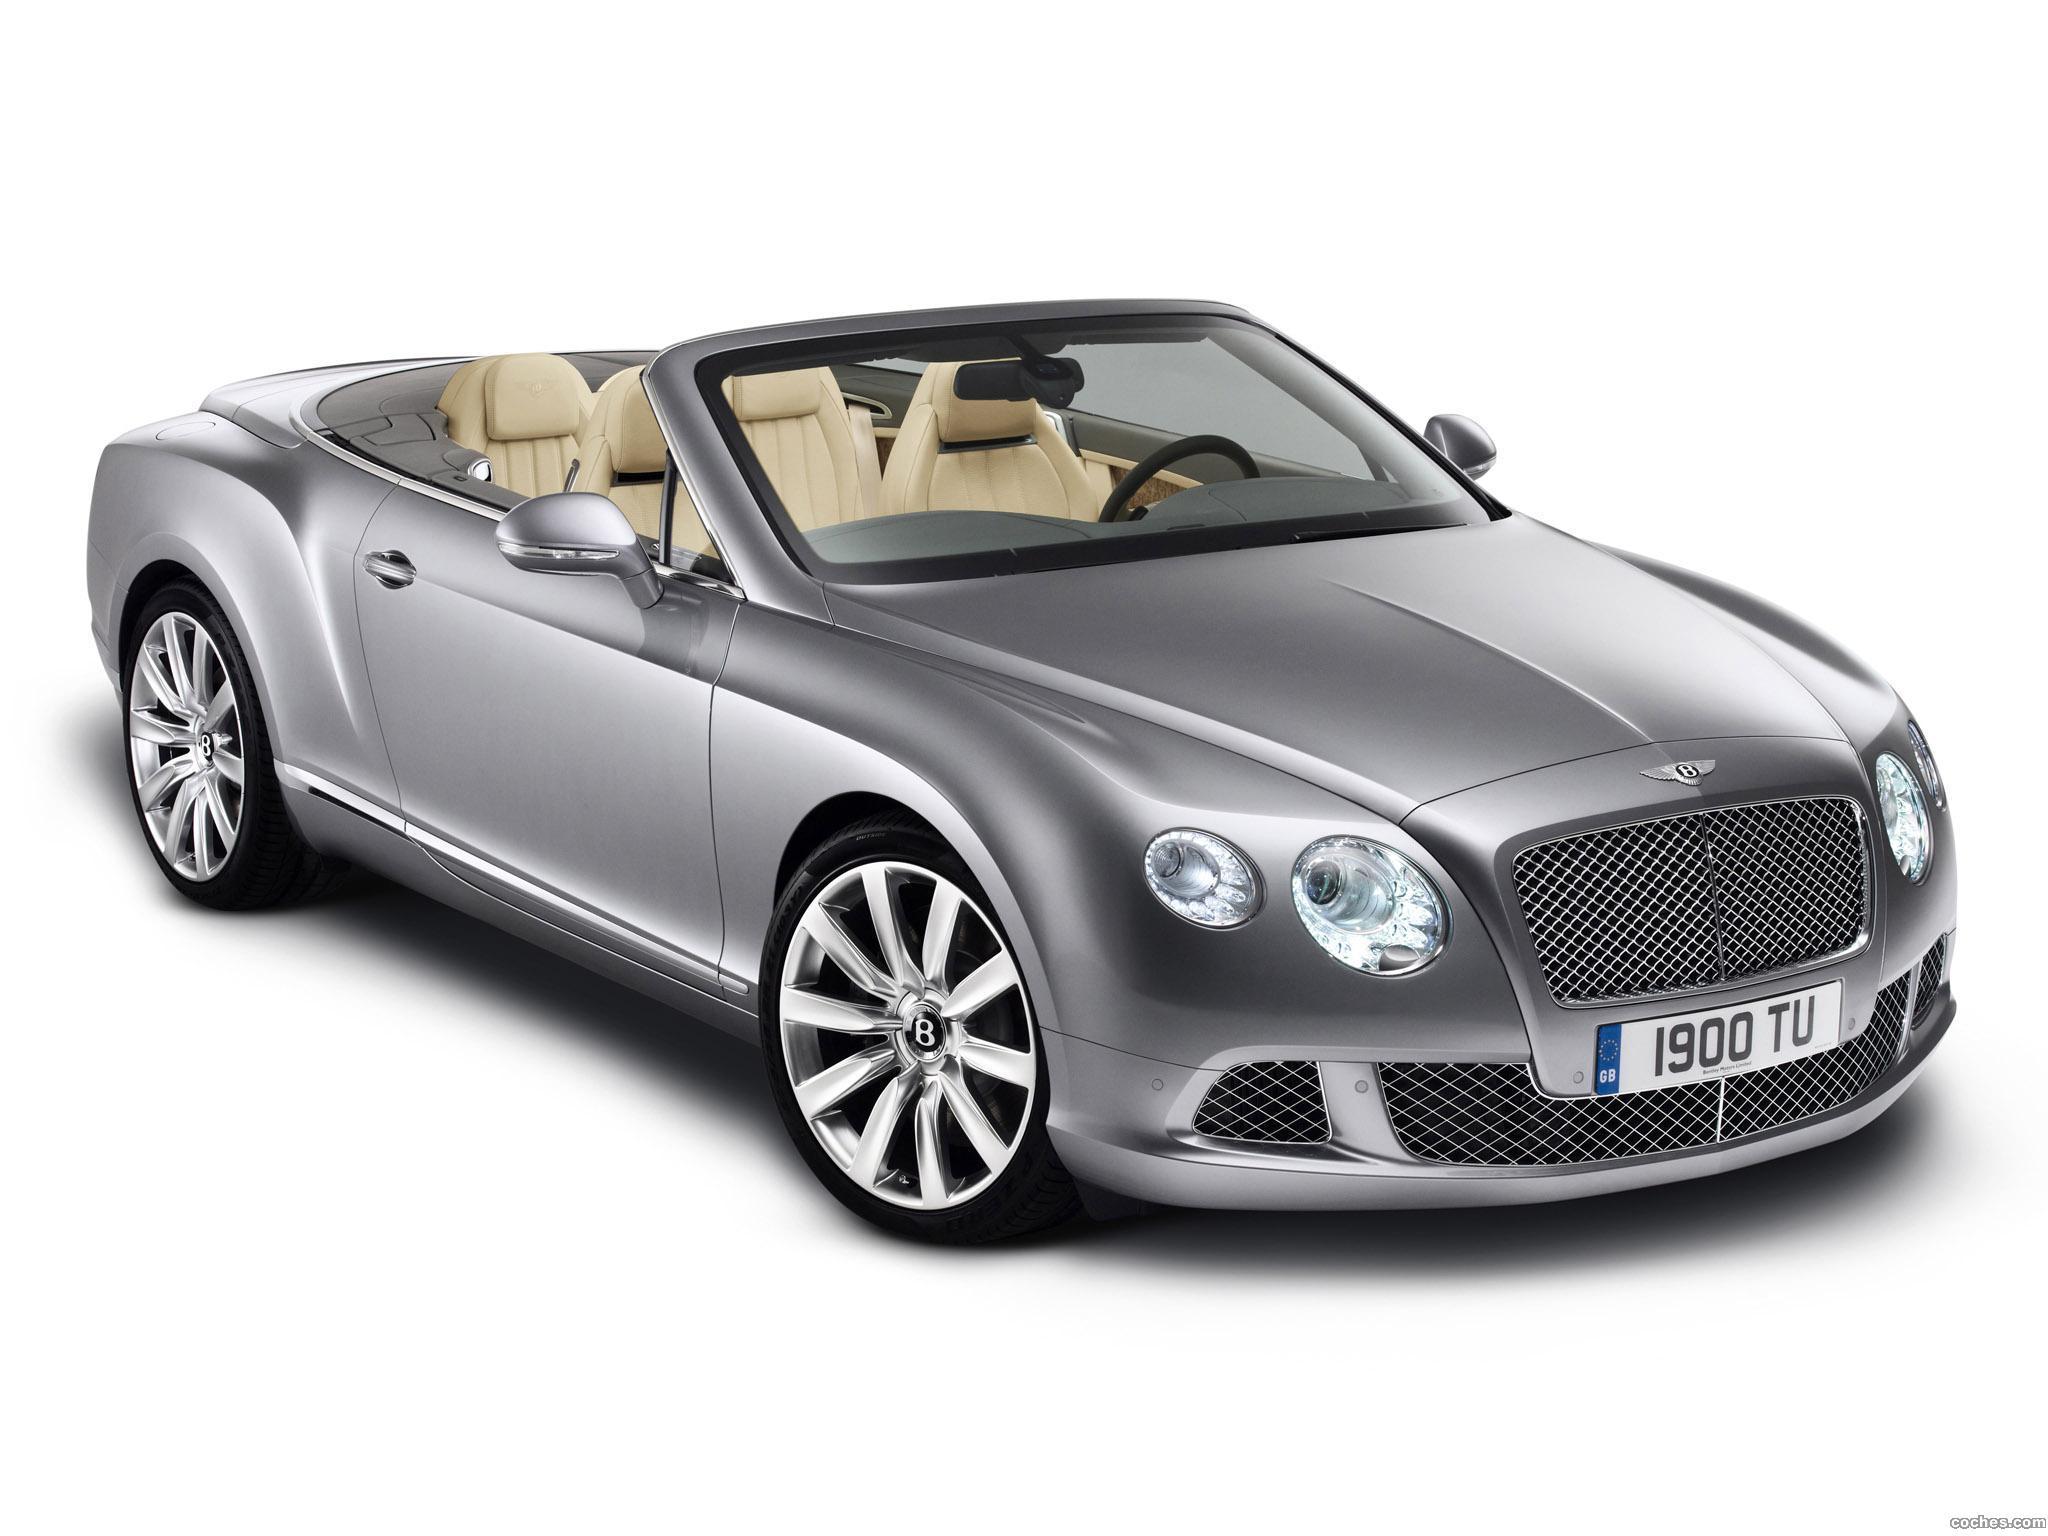 Foto 1 de Bentley Continental GTC 2011